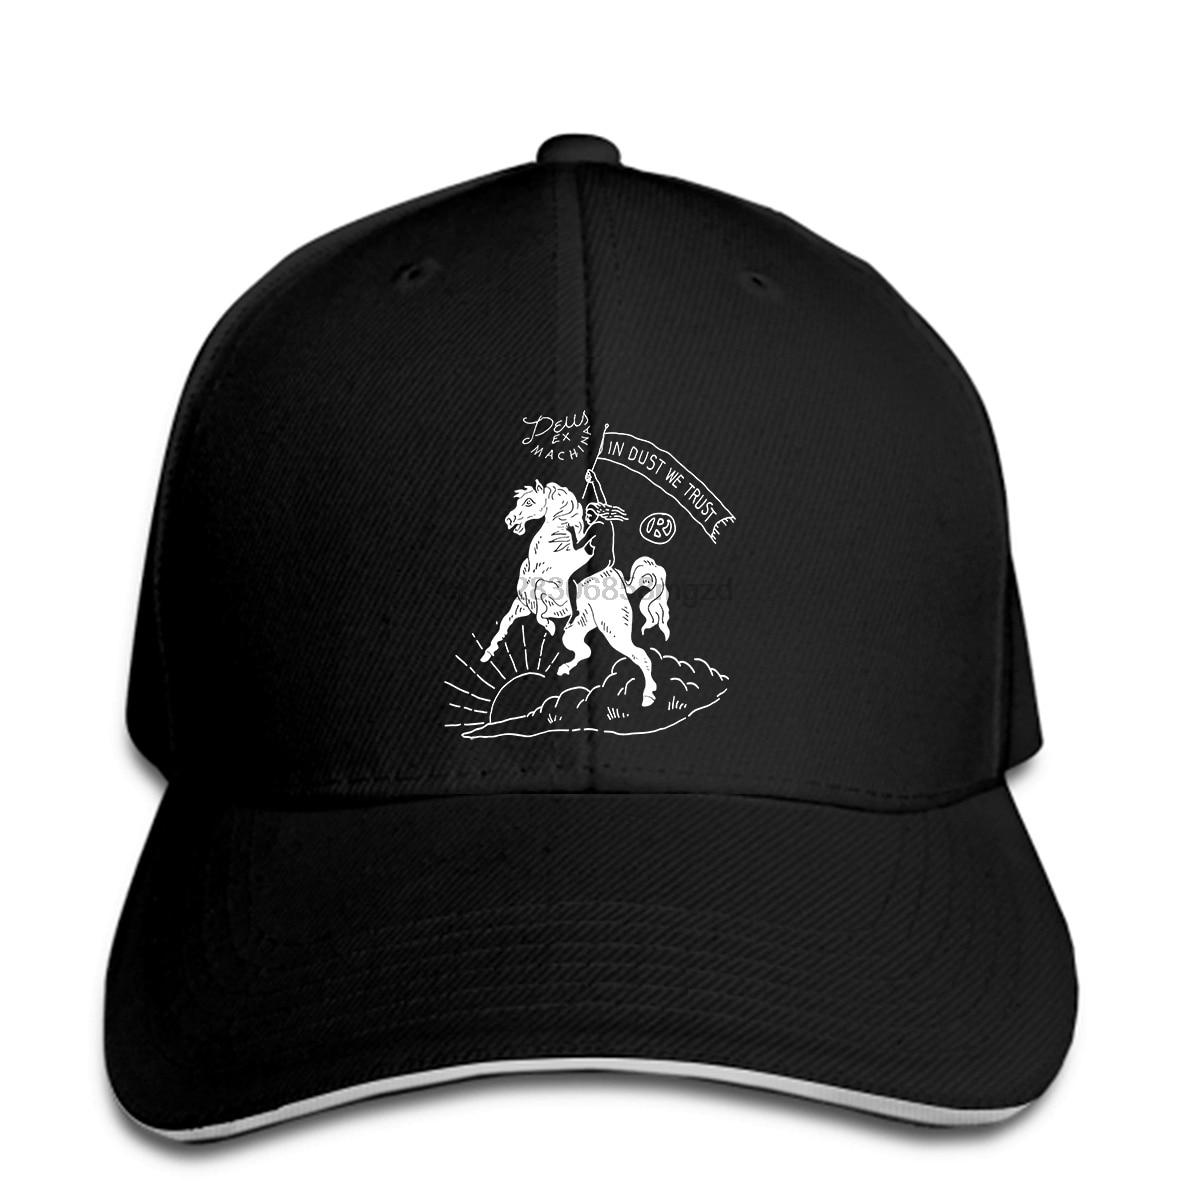 Nueva gorra de béisbol para hombre EX MACHINA azul marino de semental para hombre pequeña gorra de béisbol para mujer